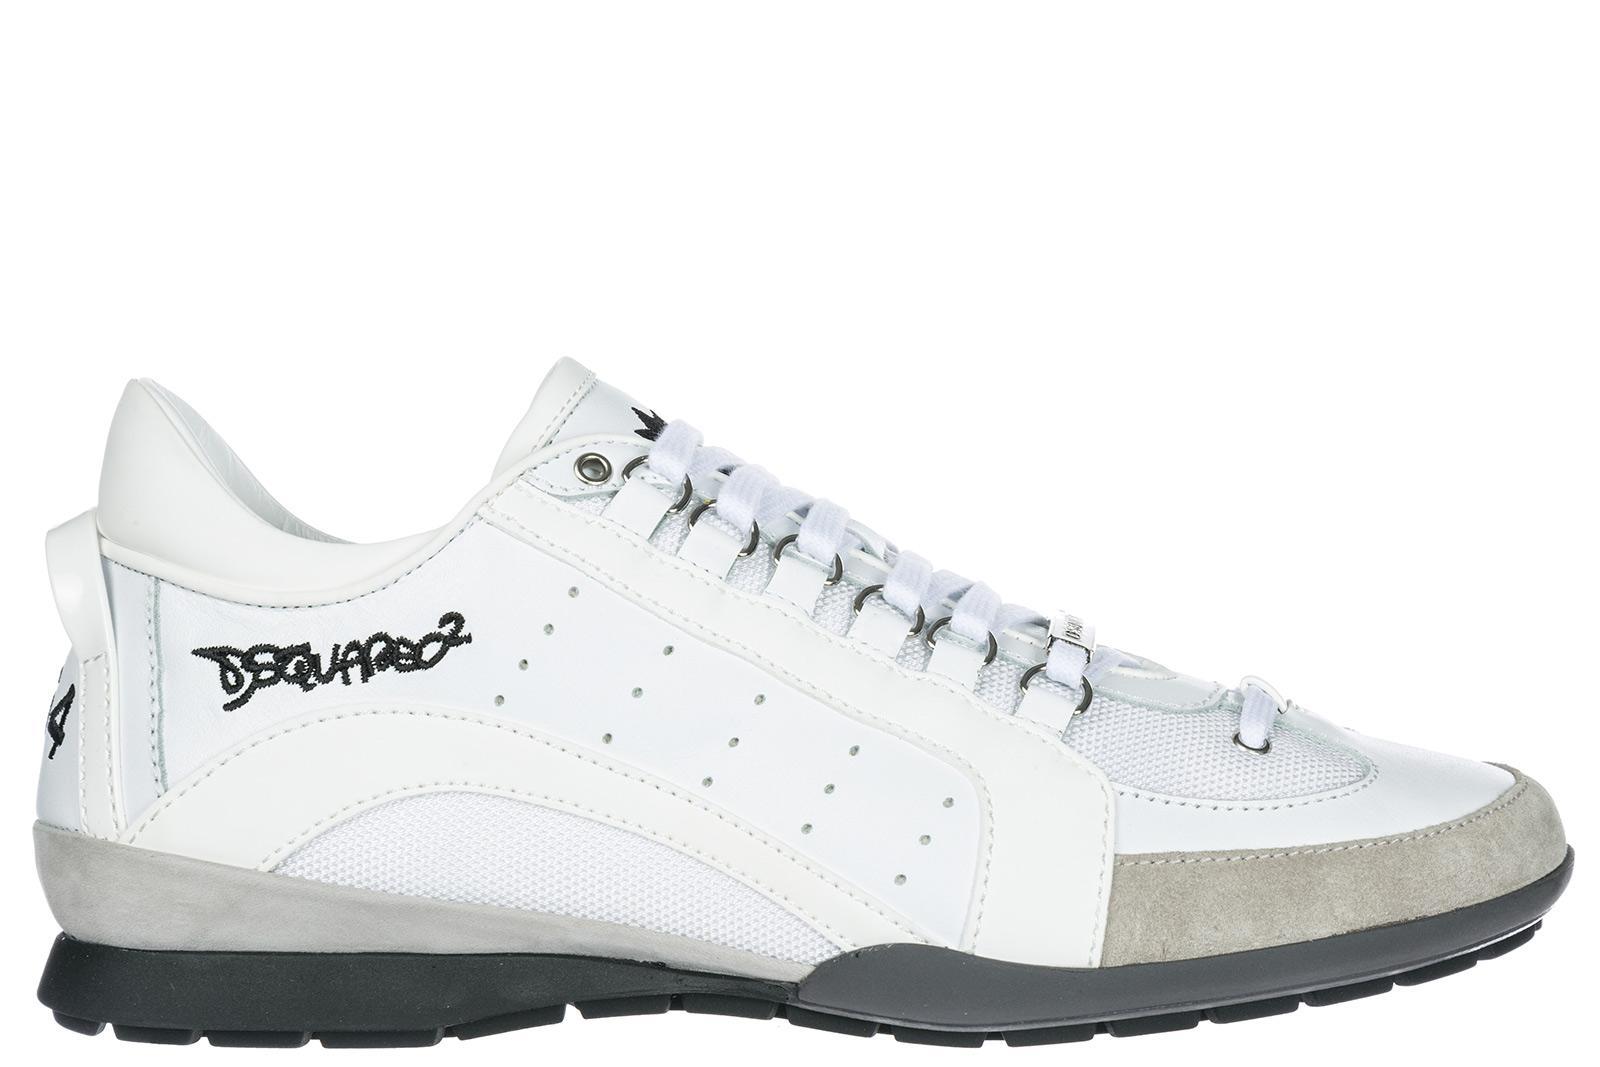 Herrenschuhe Herren Leder Schuhe Sneakers 551 In White